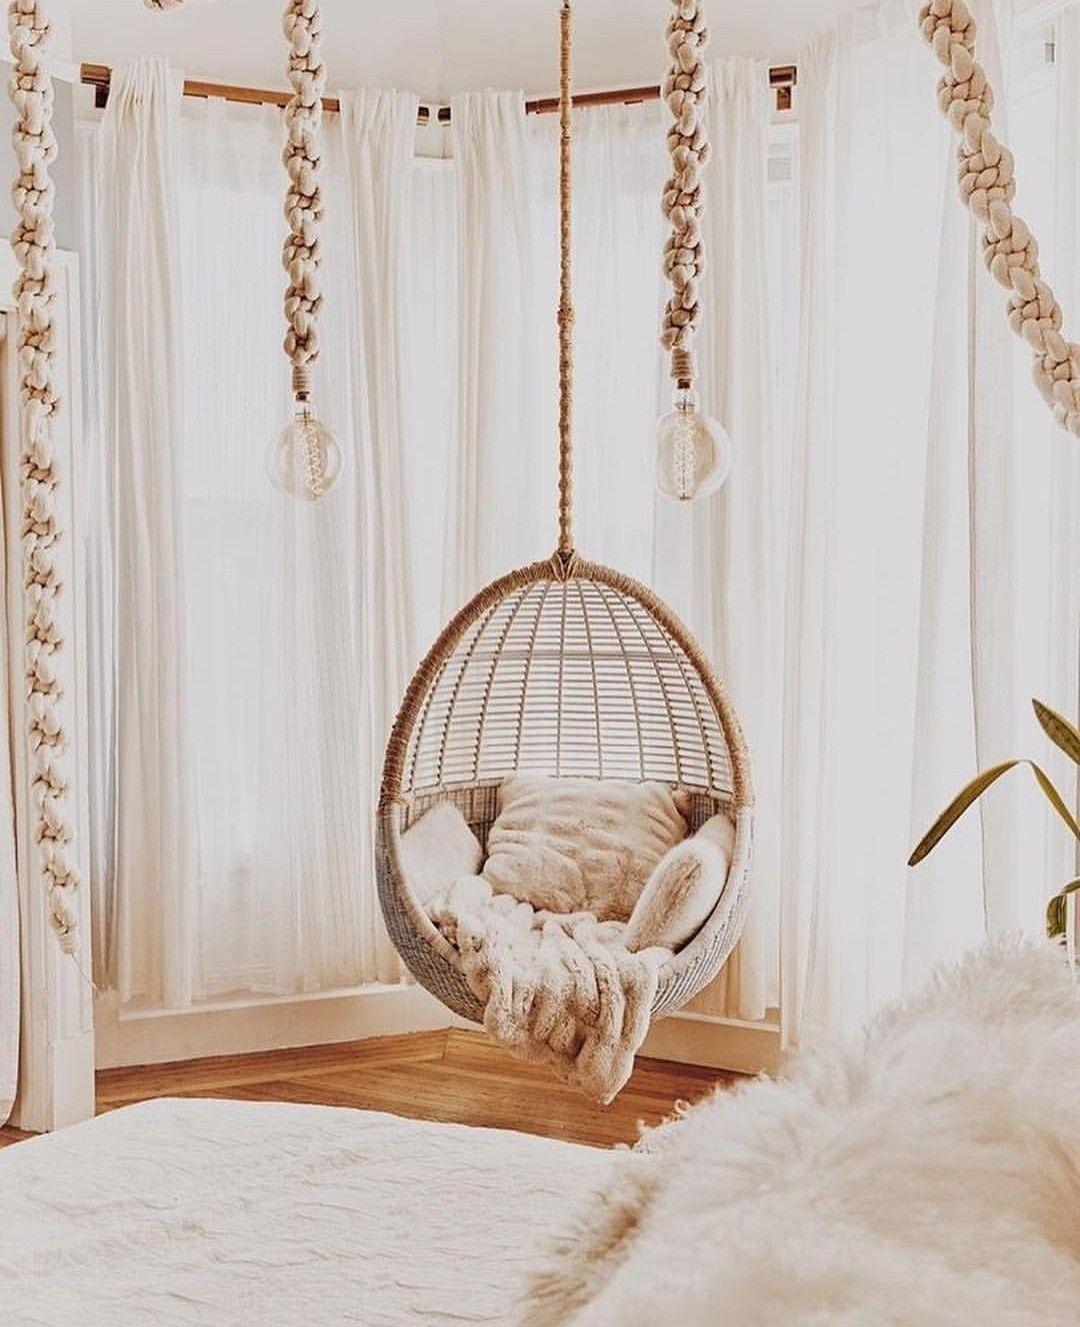 Pin By Bohoasis On Boho Decor Bedroom Decor Room Decor Cute